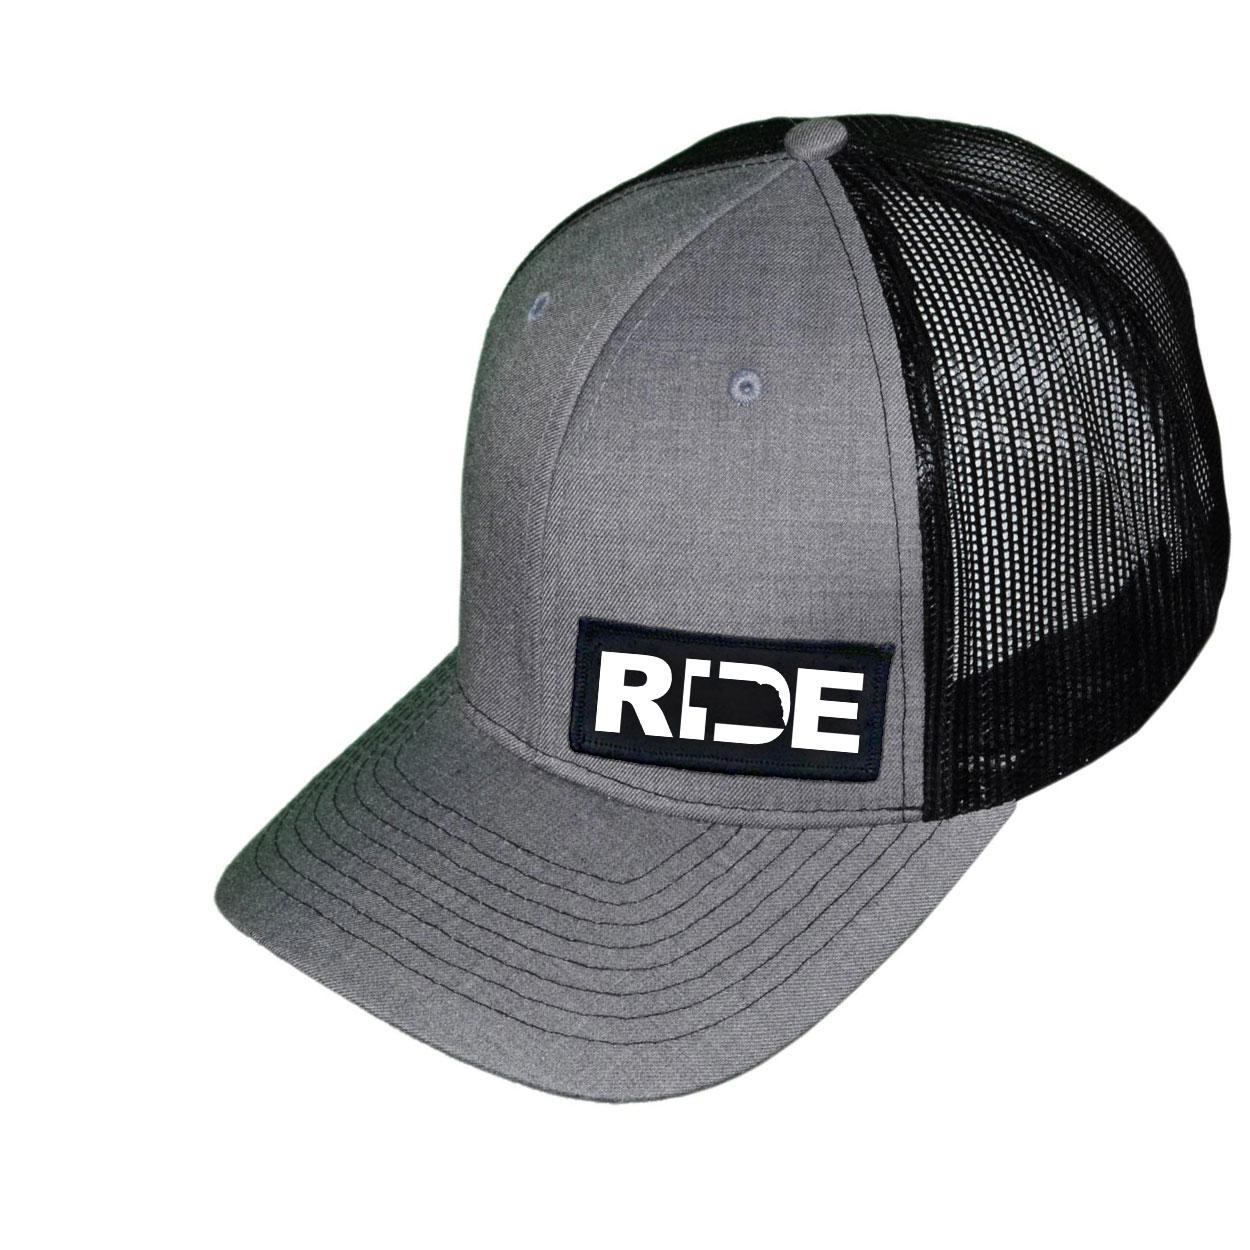 Ride Nebraska Night Out Woven Patch Snapback Trucker Hat Heather Gray/Black (White Logo)